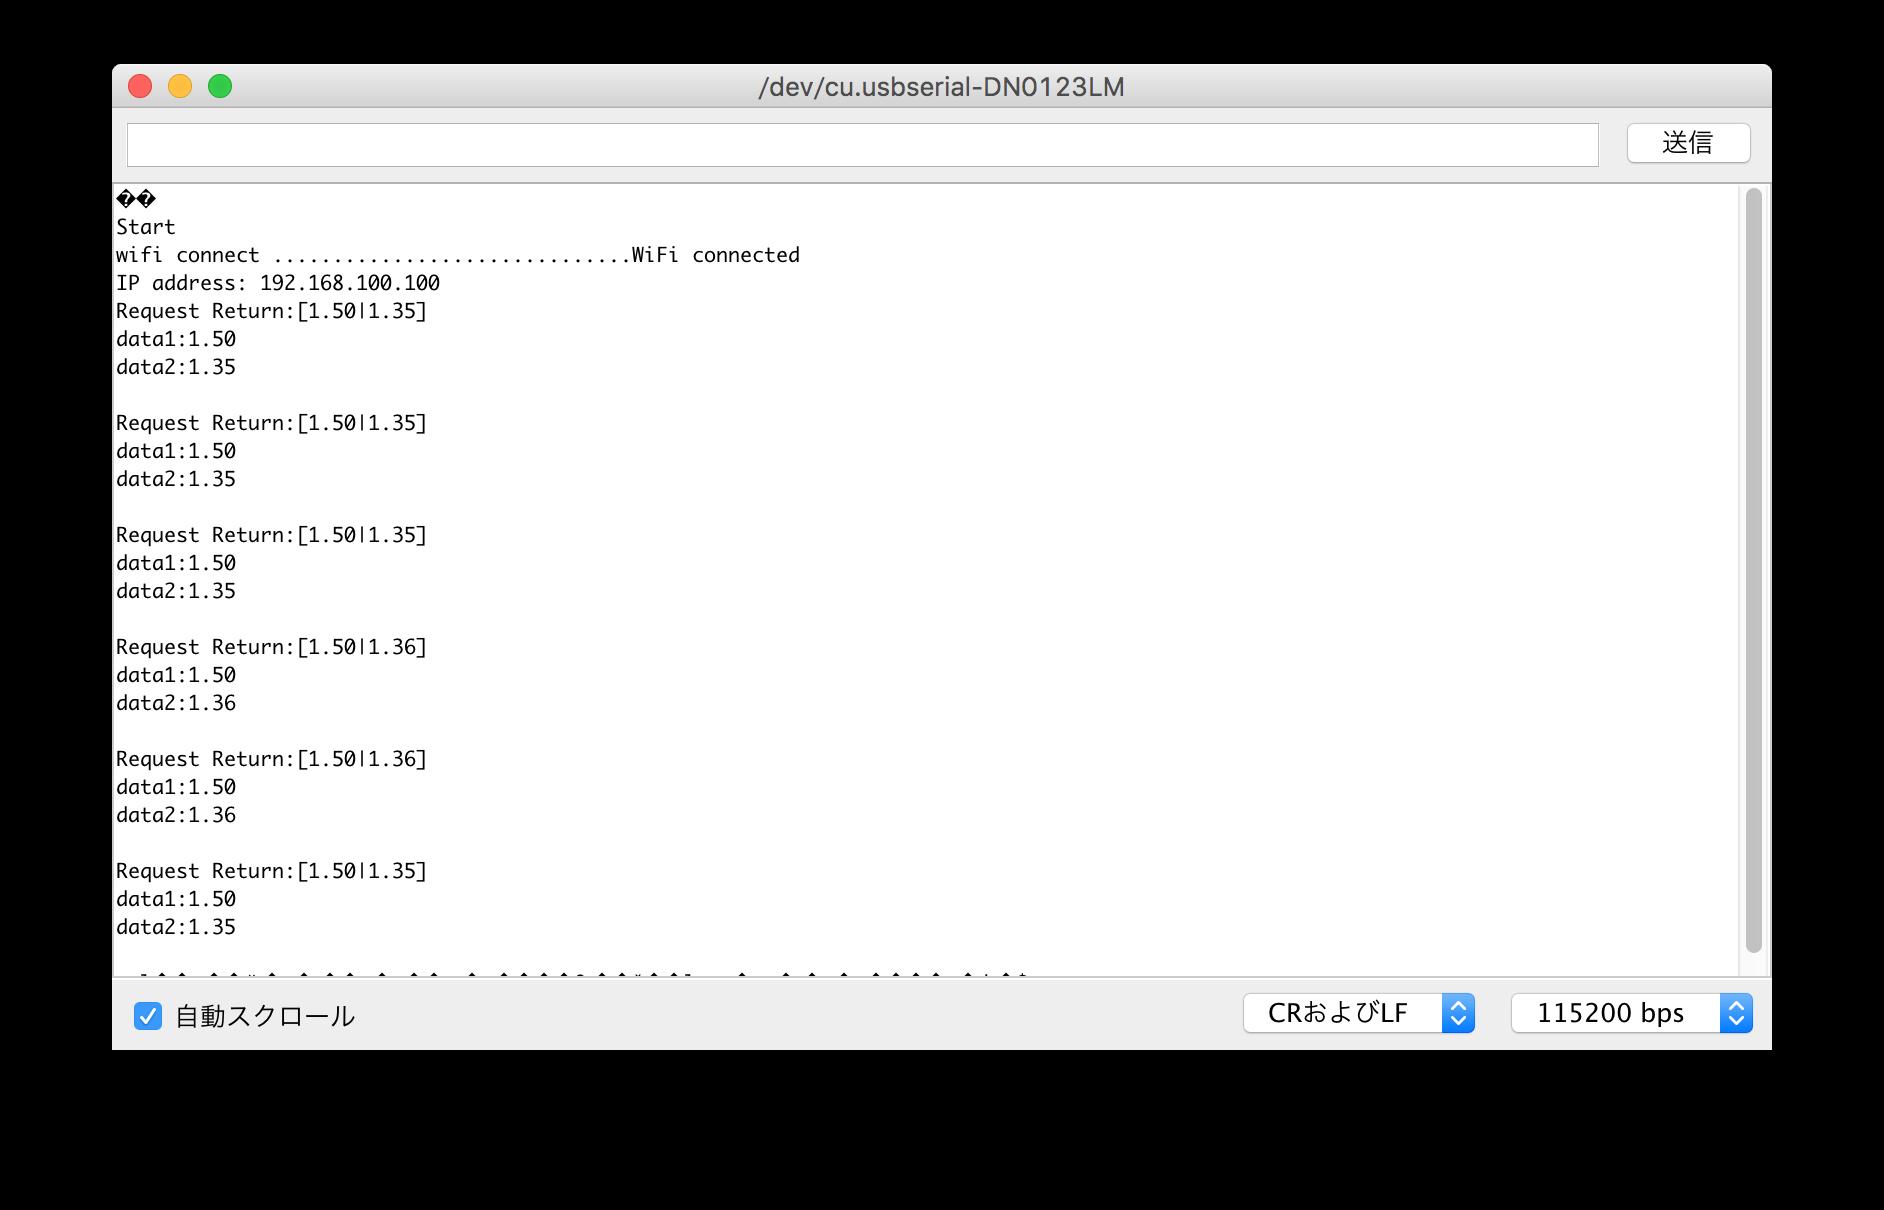 Ambient_ESP8266_BatteryCheck.png (217.6 kB)